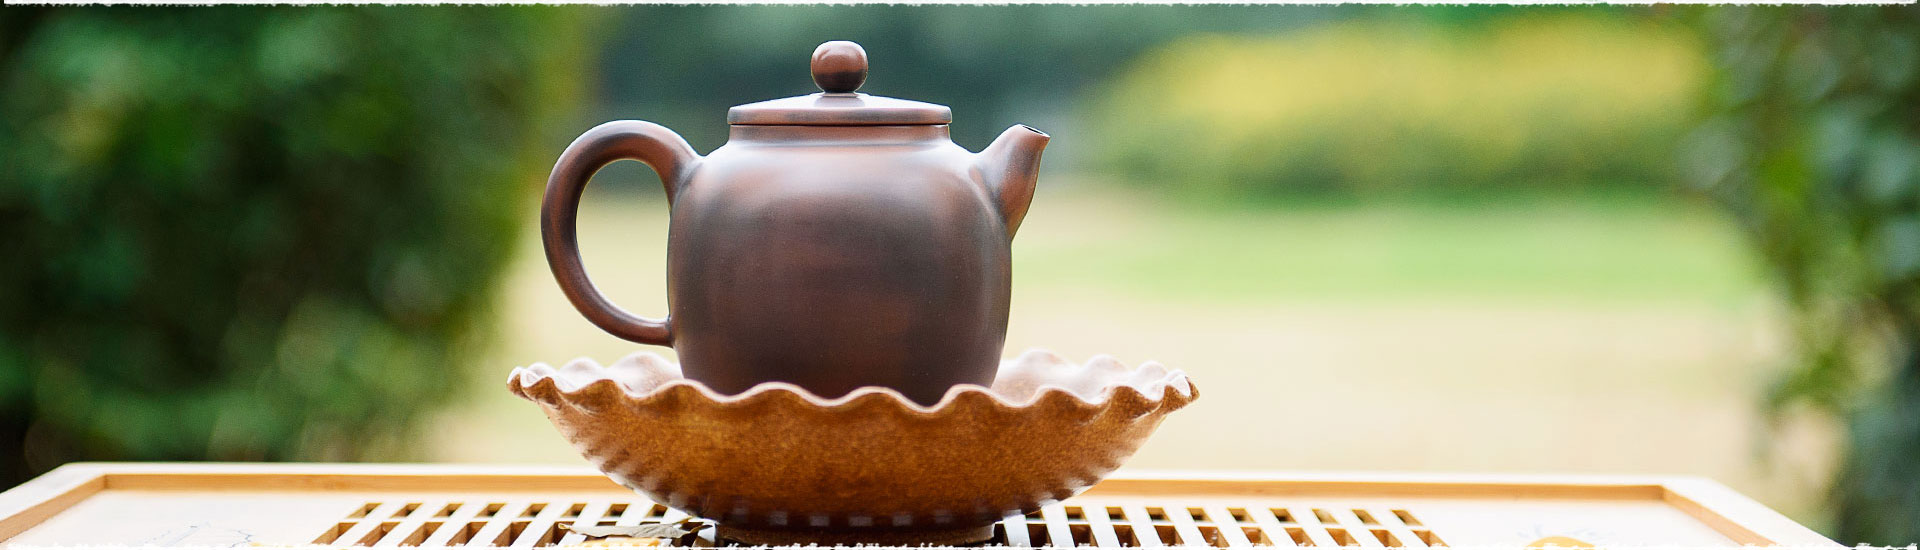 Nixing Teapot